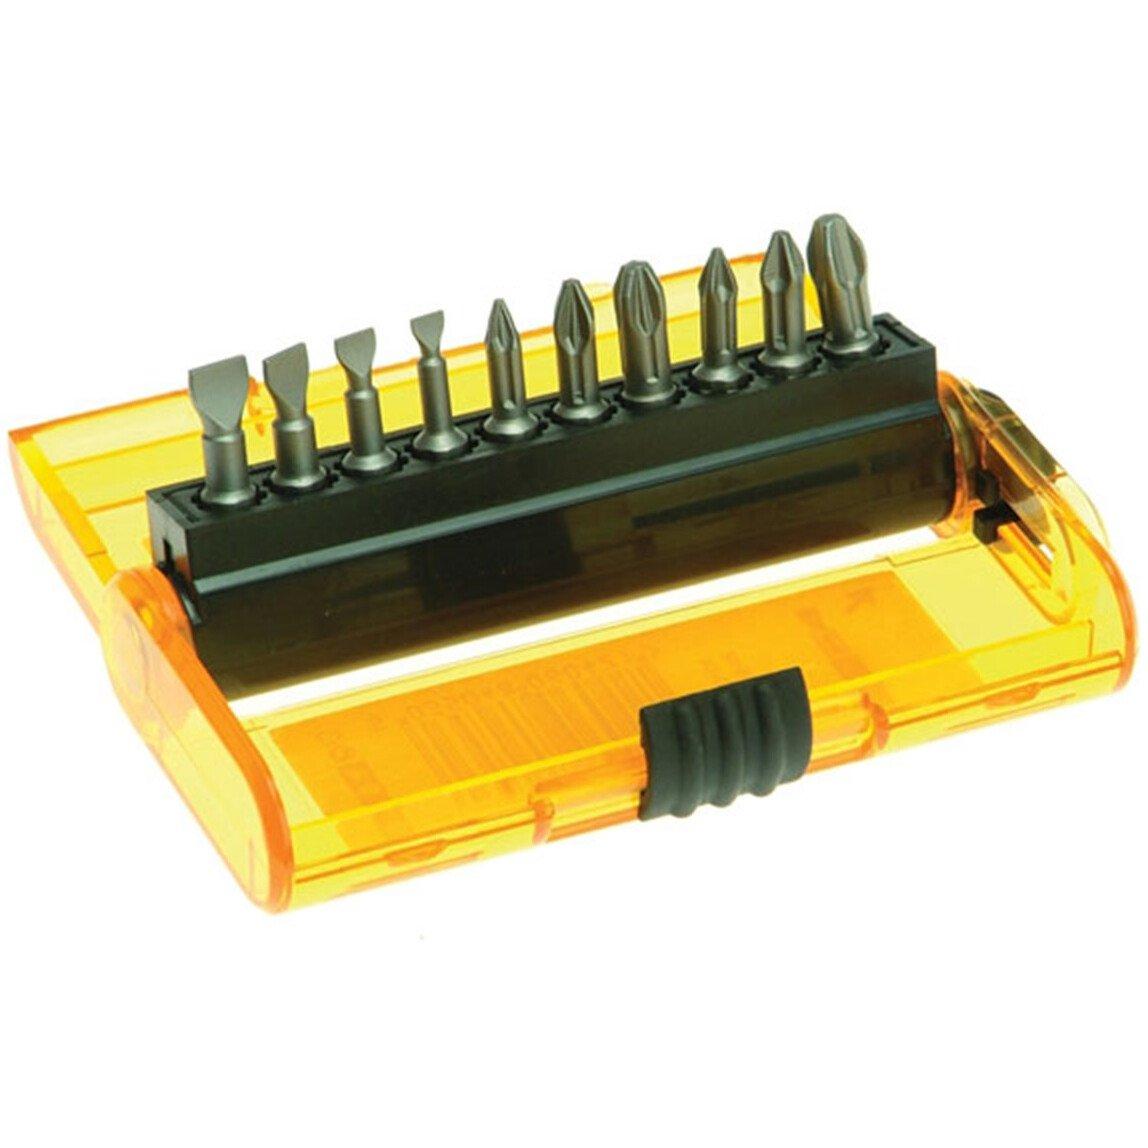 DeWalt DT7915-QZ Screwdriver Bit Set 11 Piece Set